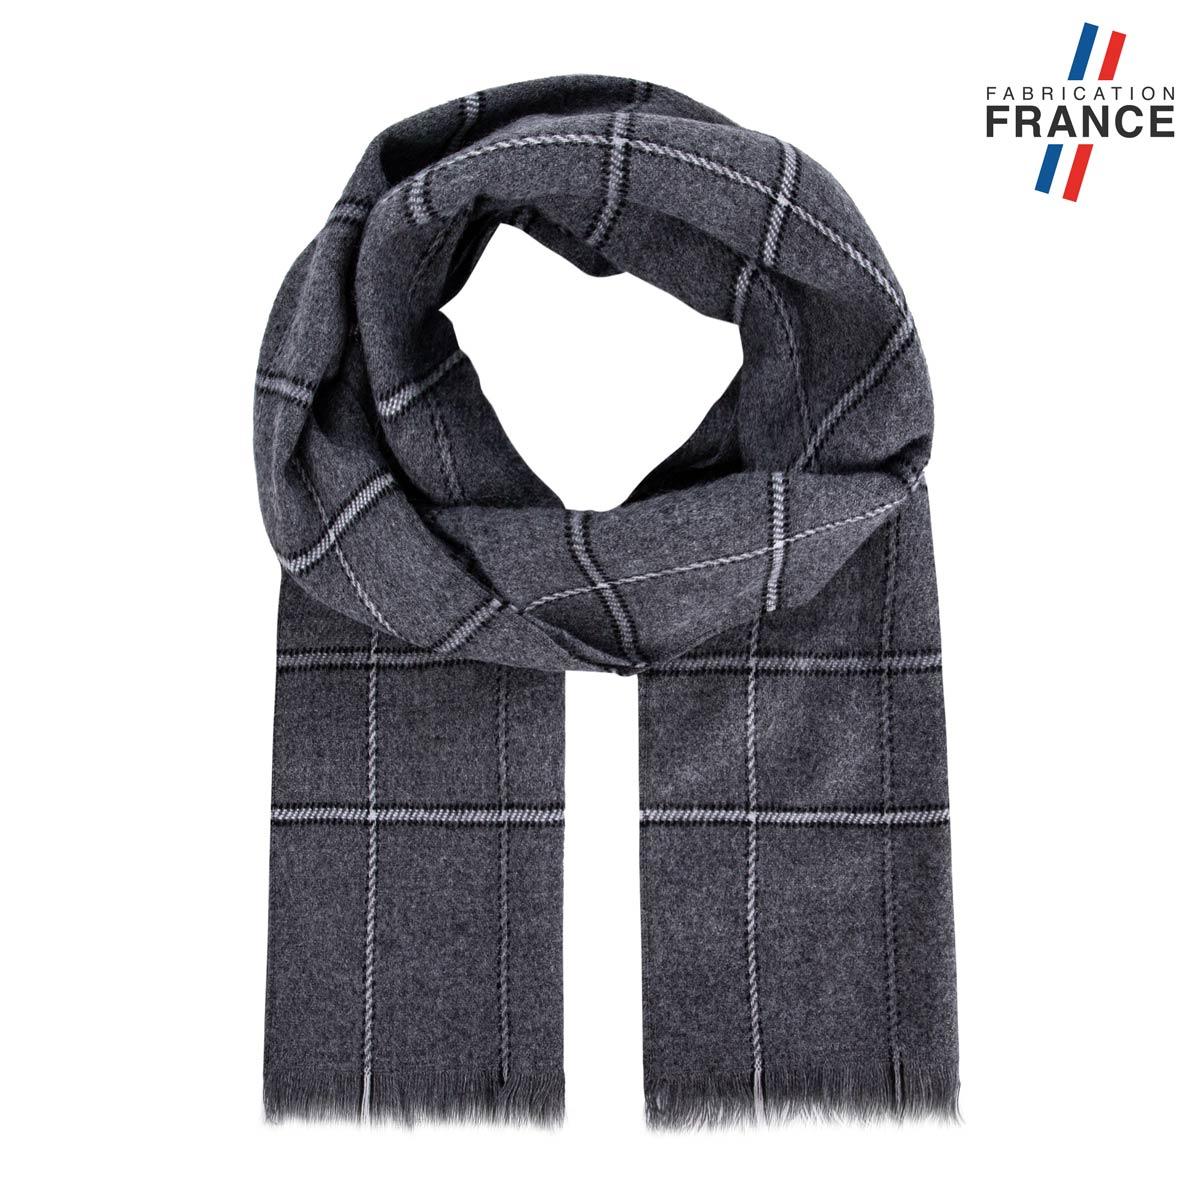 AT-04843_F12-1FR_Echarpe-grise-carreaux-fabrication-france